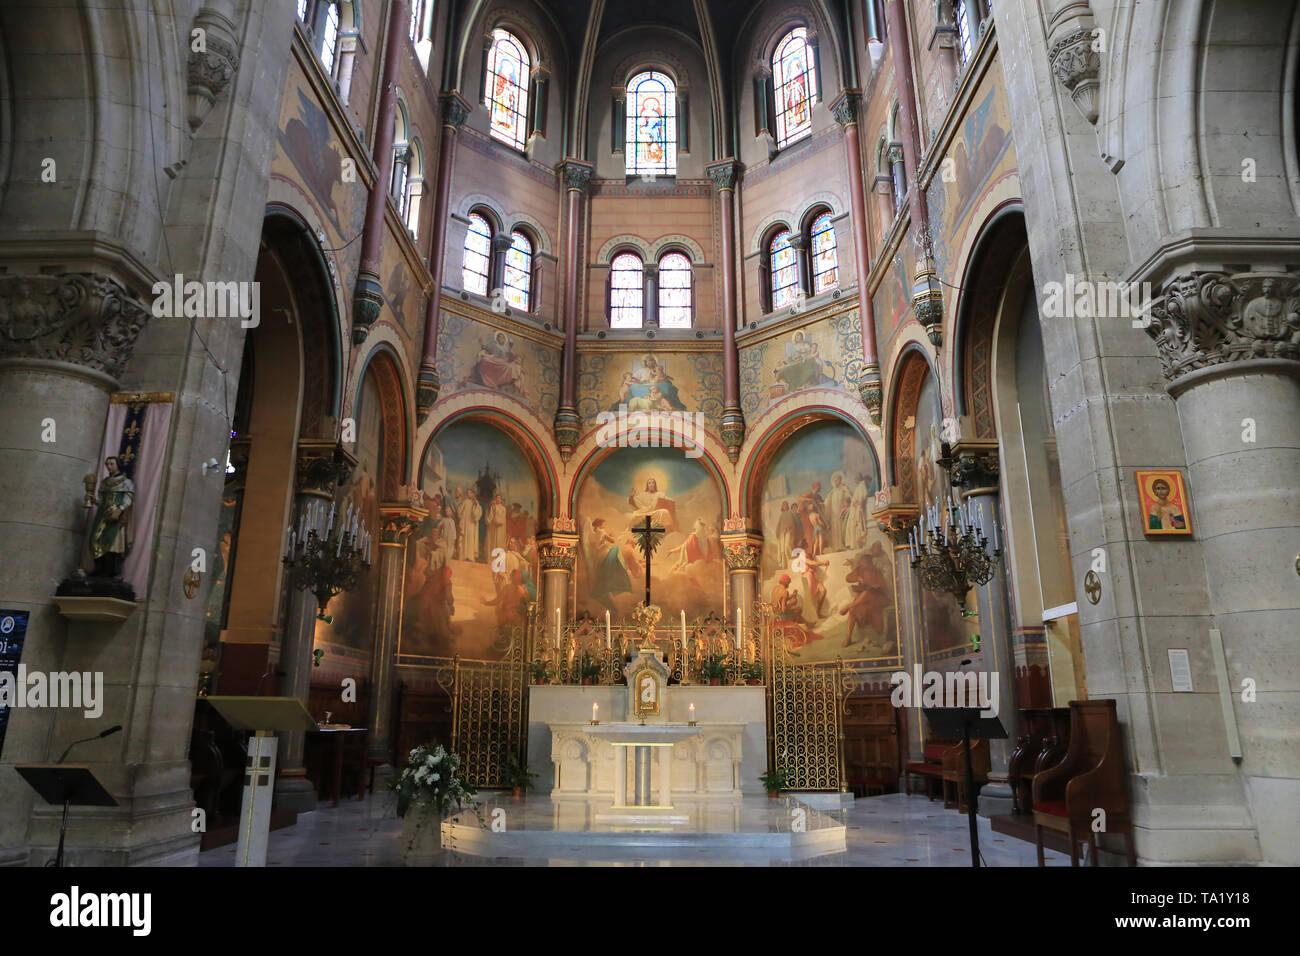 Choeur. Eglise Cook. Saint-Cloud. Chor. Kirche St. Clodoald. Saint-Cloud. Stockbild